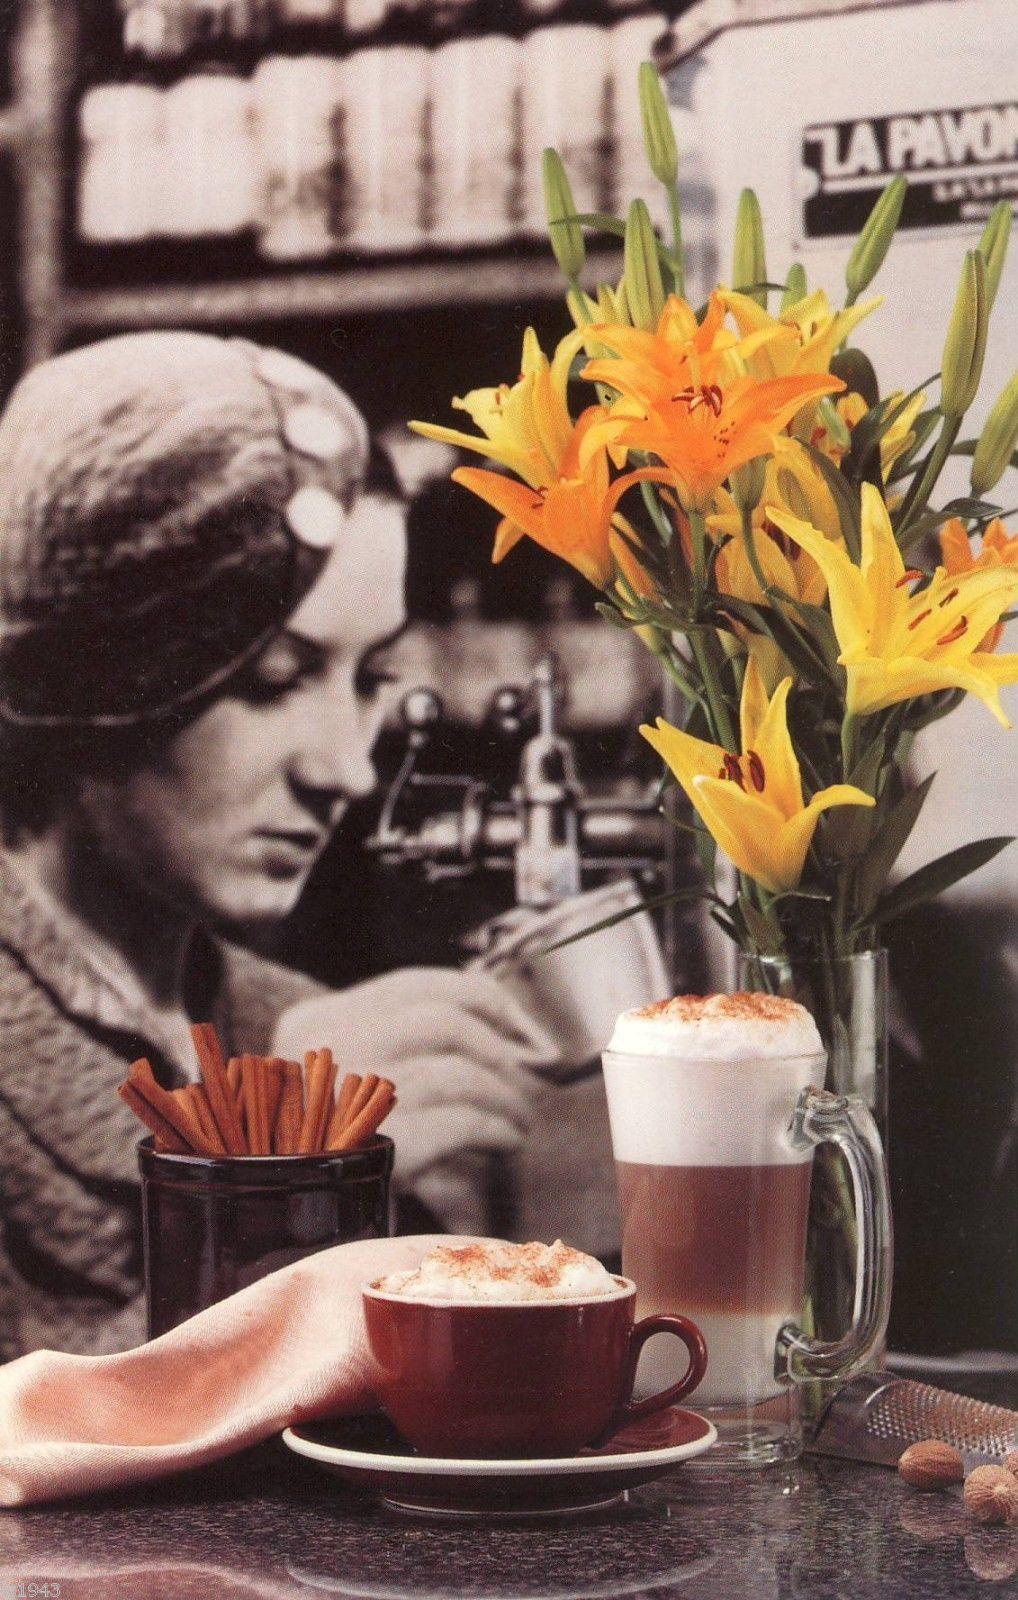 American Vintage Chocolate Hazelnut Bold Roasted Coffee 10oz Free Shipping